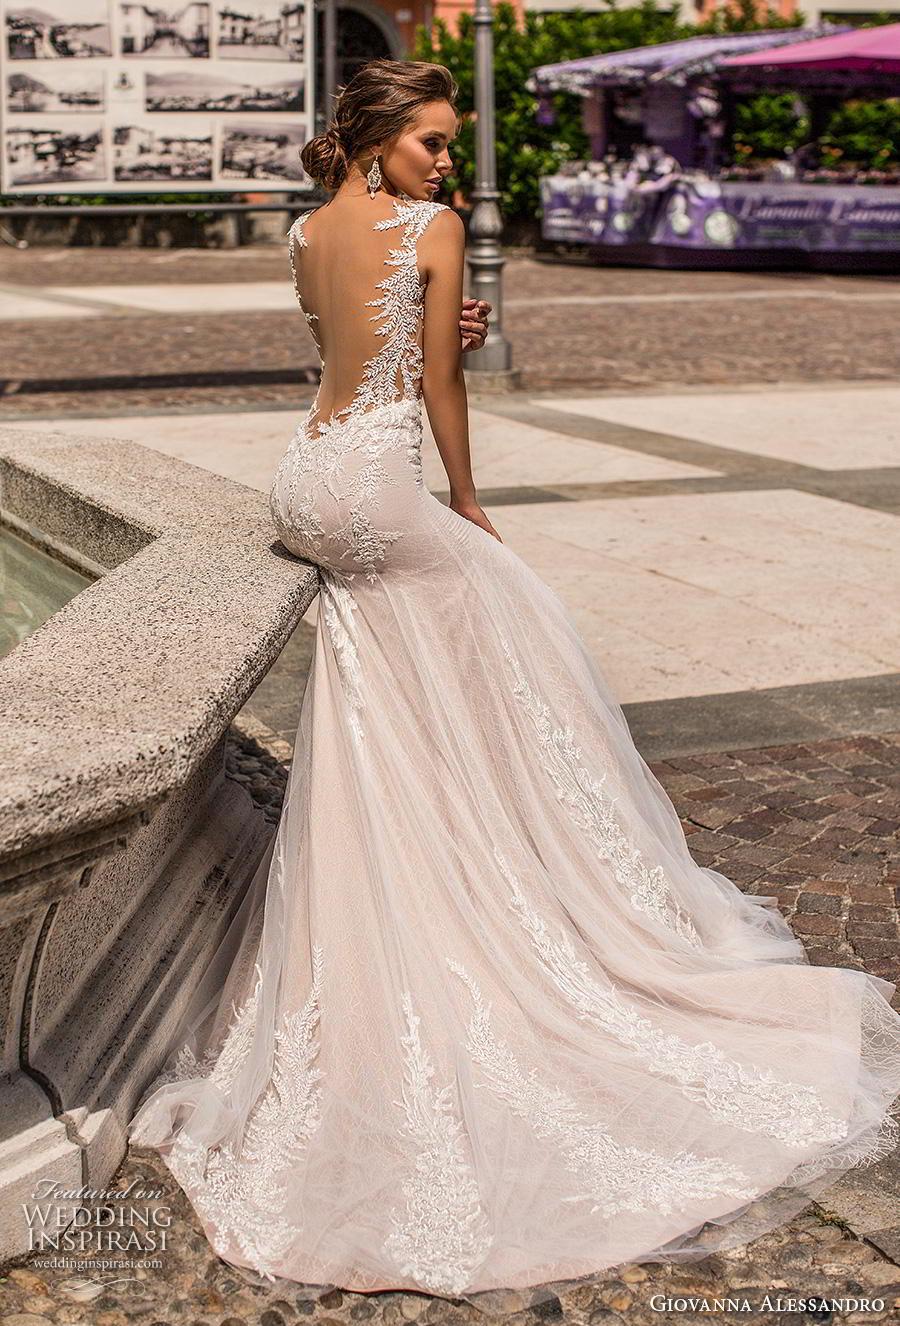 giovanna alessandro 2019 bridal sleeveless illusion bateau sweetheart neckline heavily embellished bodice elegant fit and flare wedding dress backless low back chapel train (16) bv